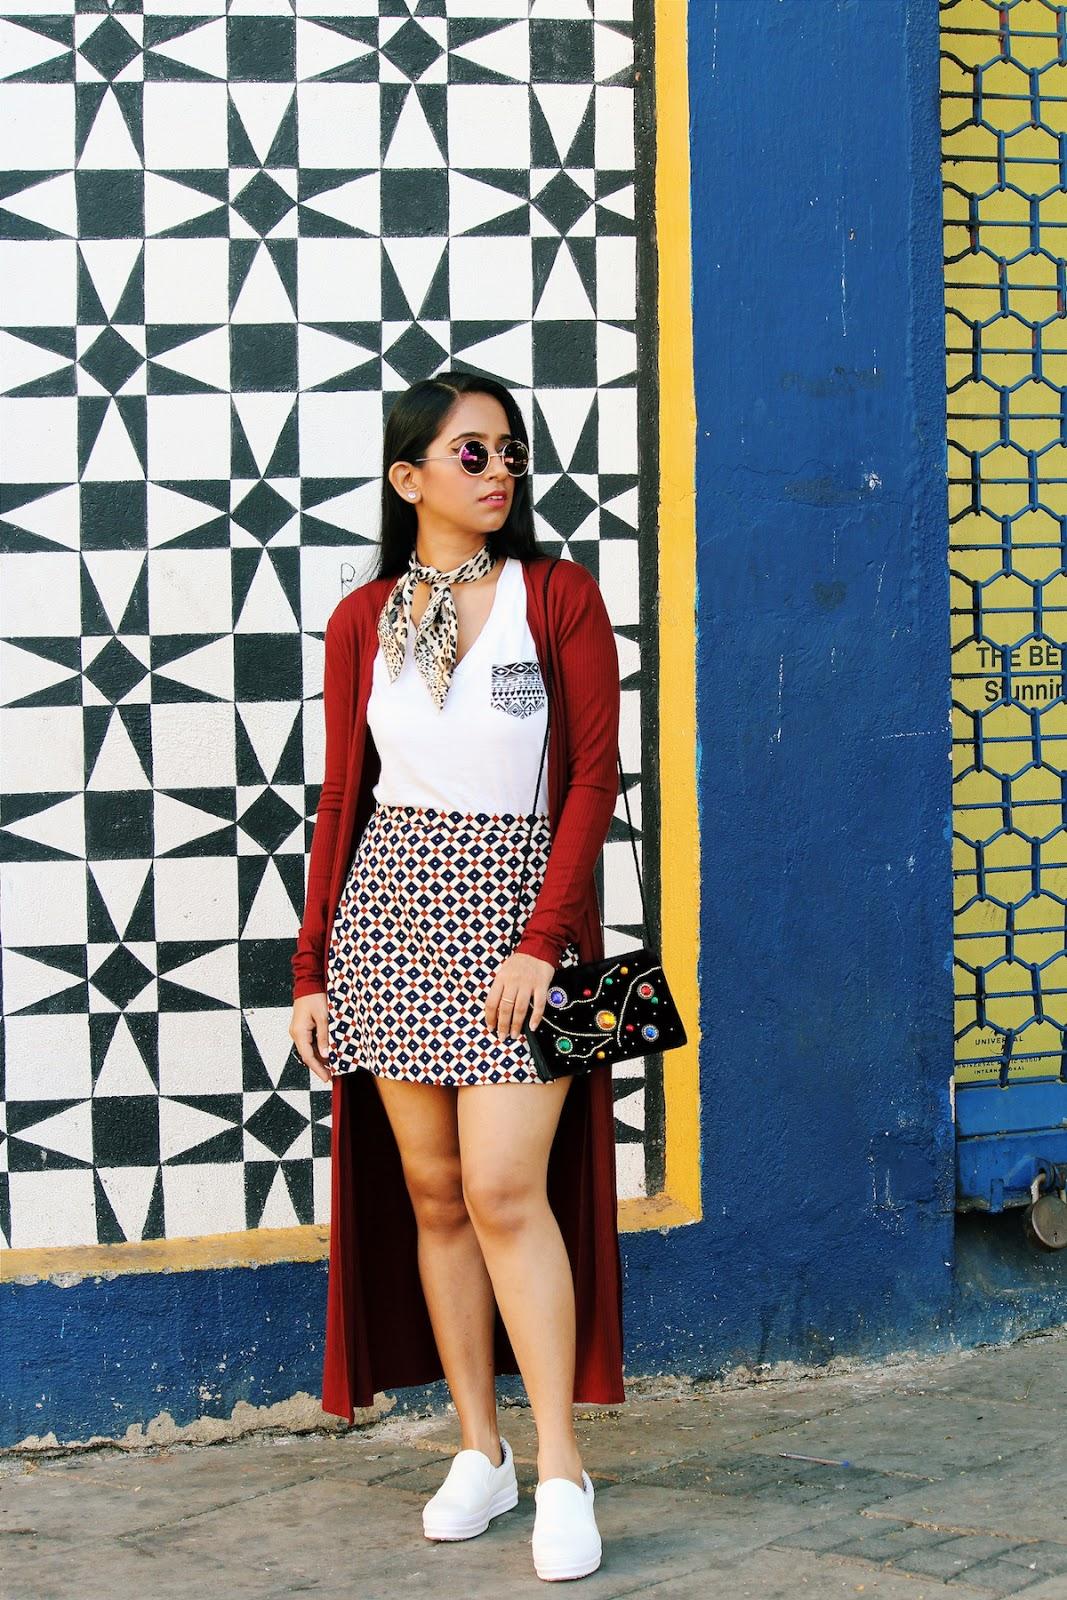 Mini skirts out of fashion 6 Ways To Style A Mini Skirt